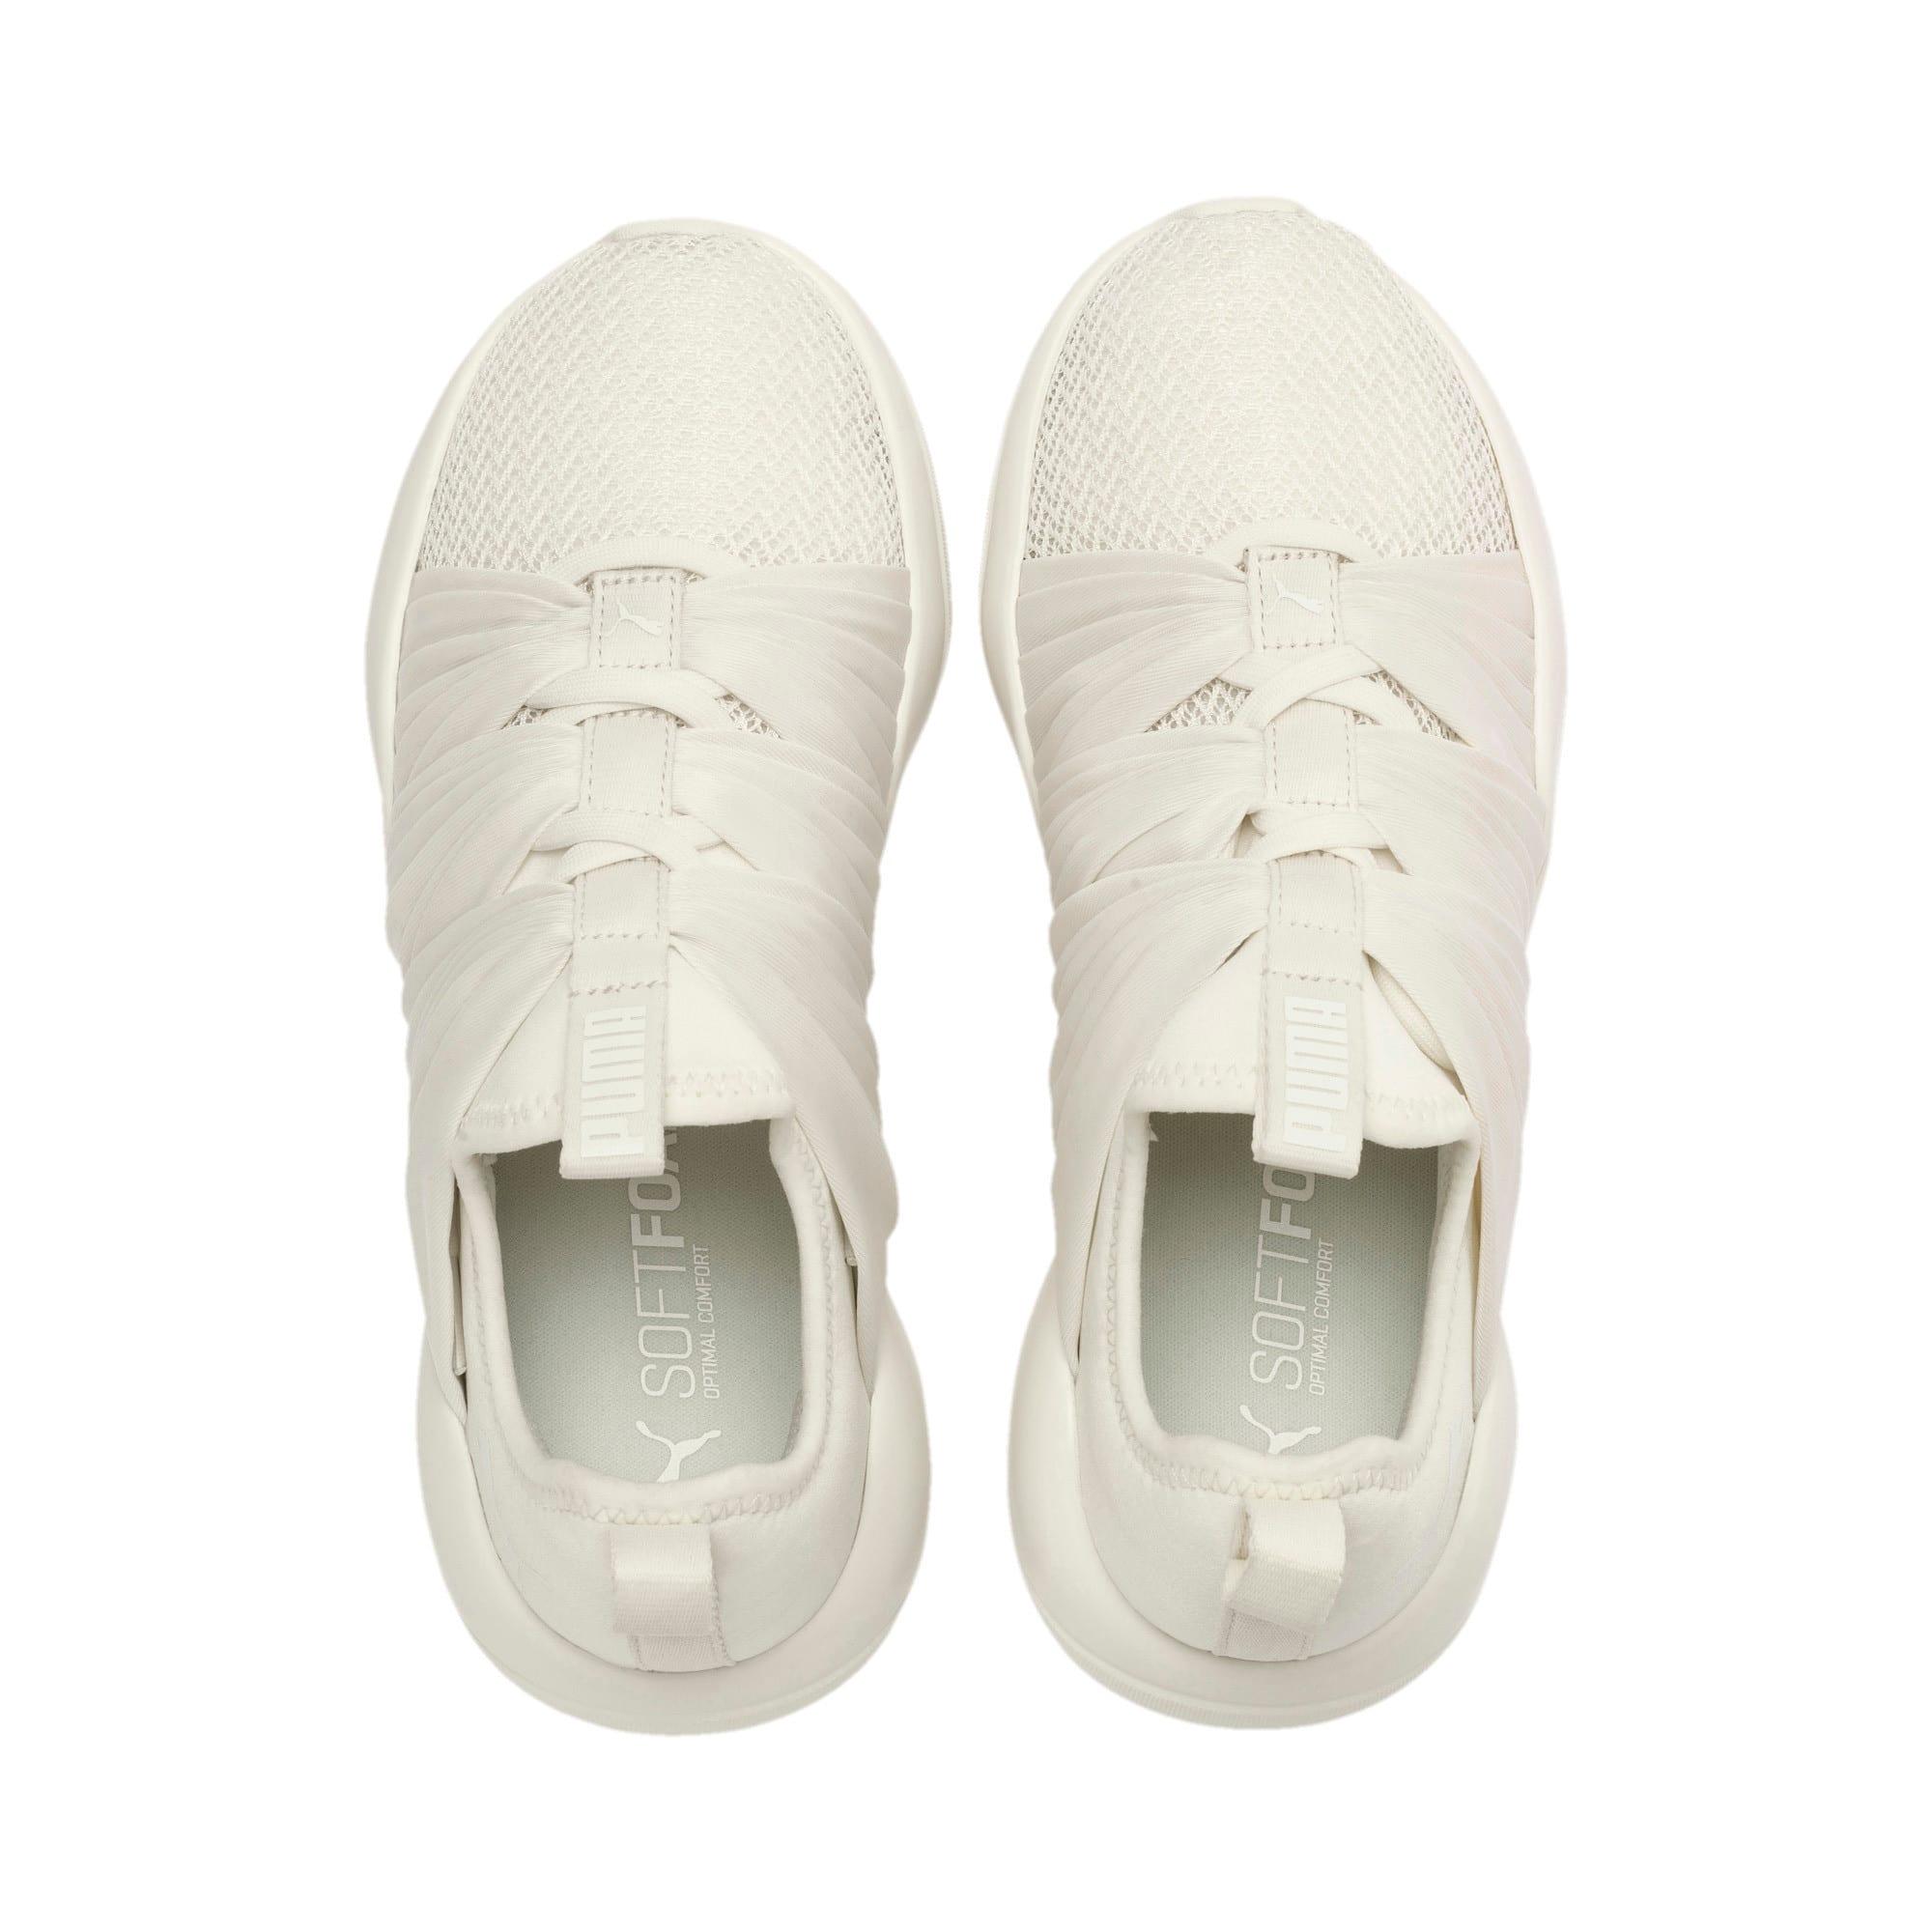 Thumbnail 6 of フラーリッシュ ウィメンズ, Whisper White-Puma White, medium-JPN